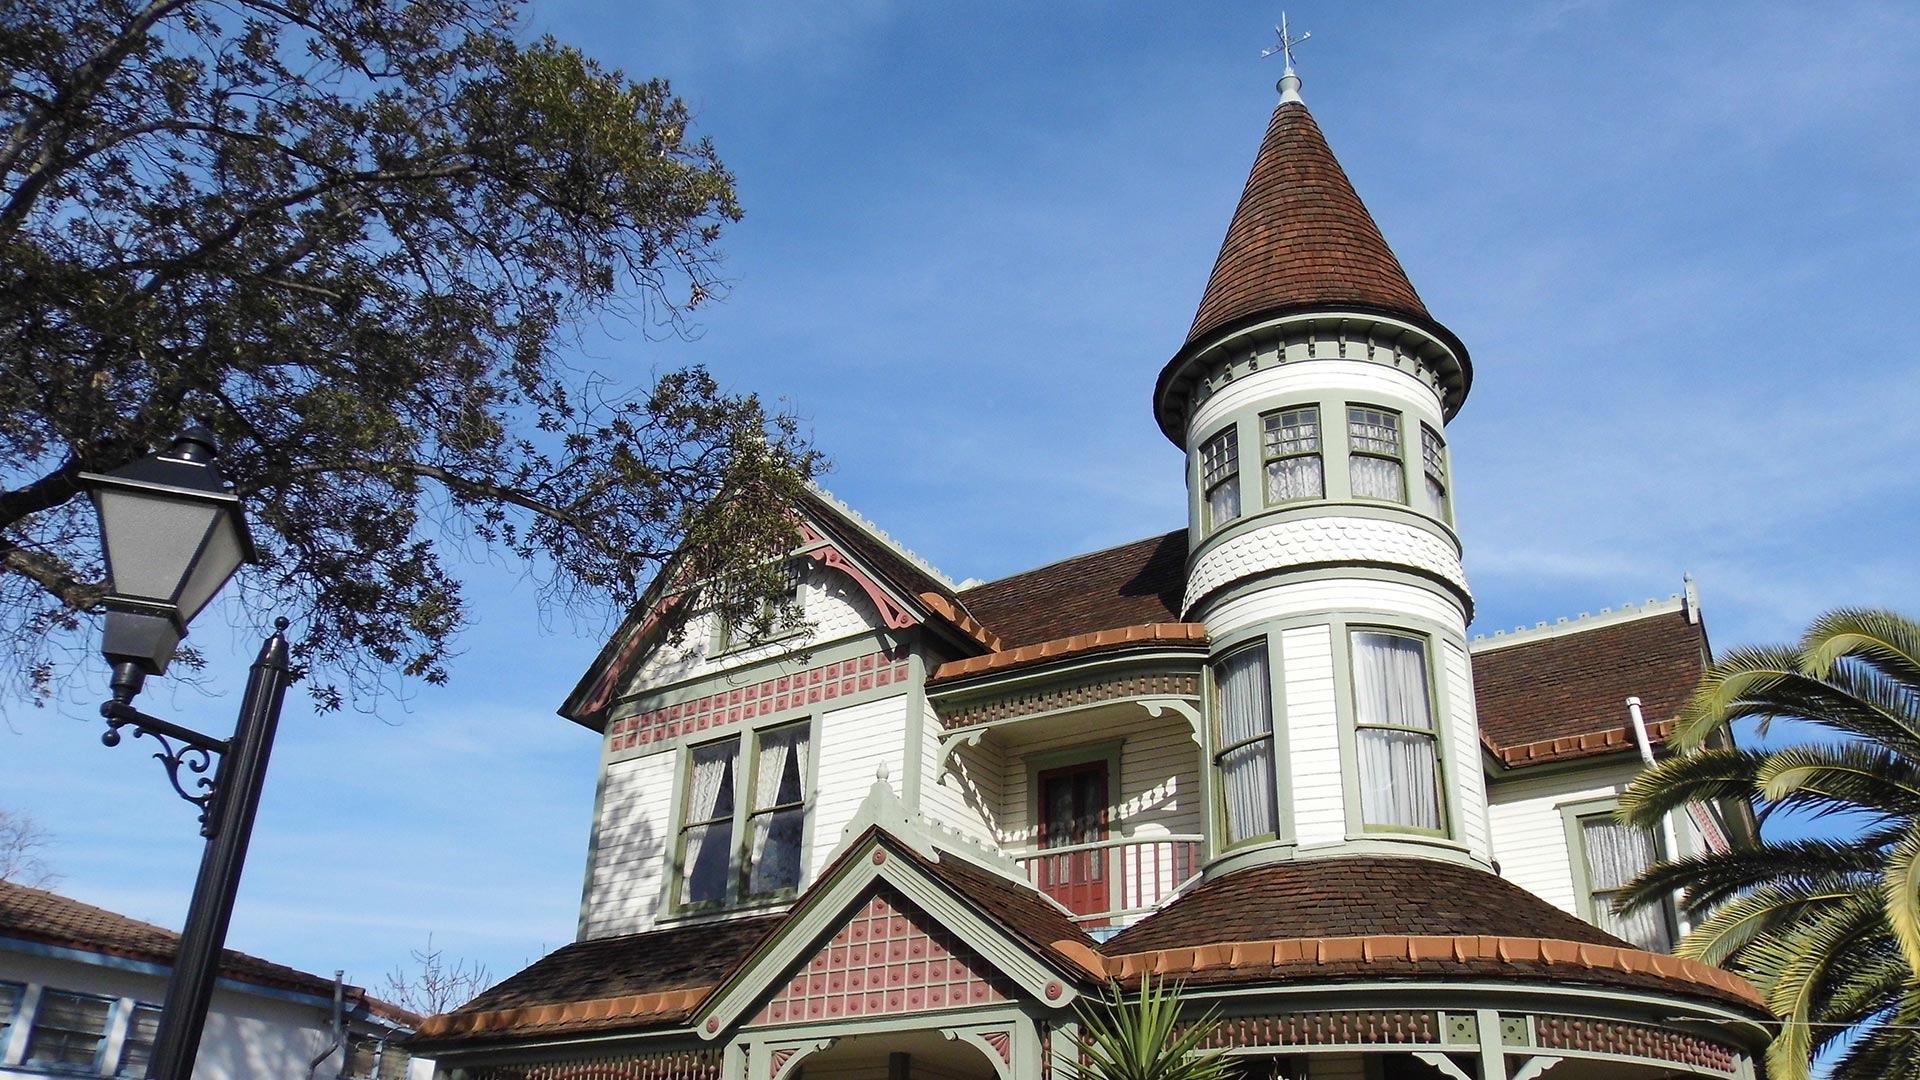 The John Woelke House at Founder's Park.